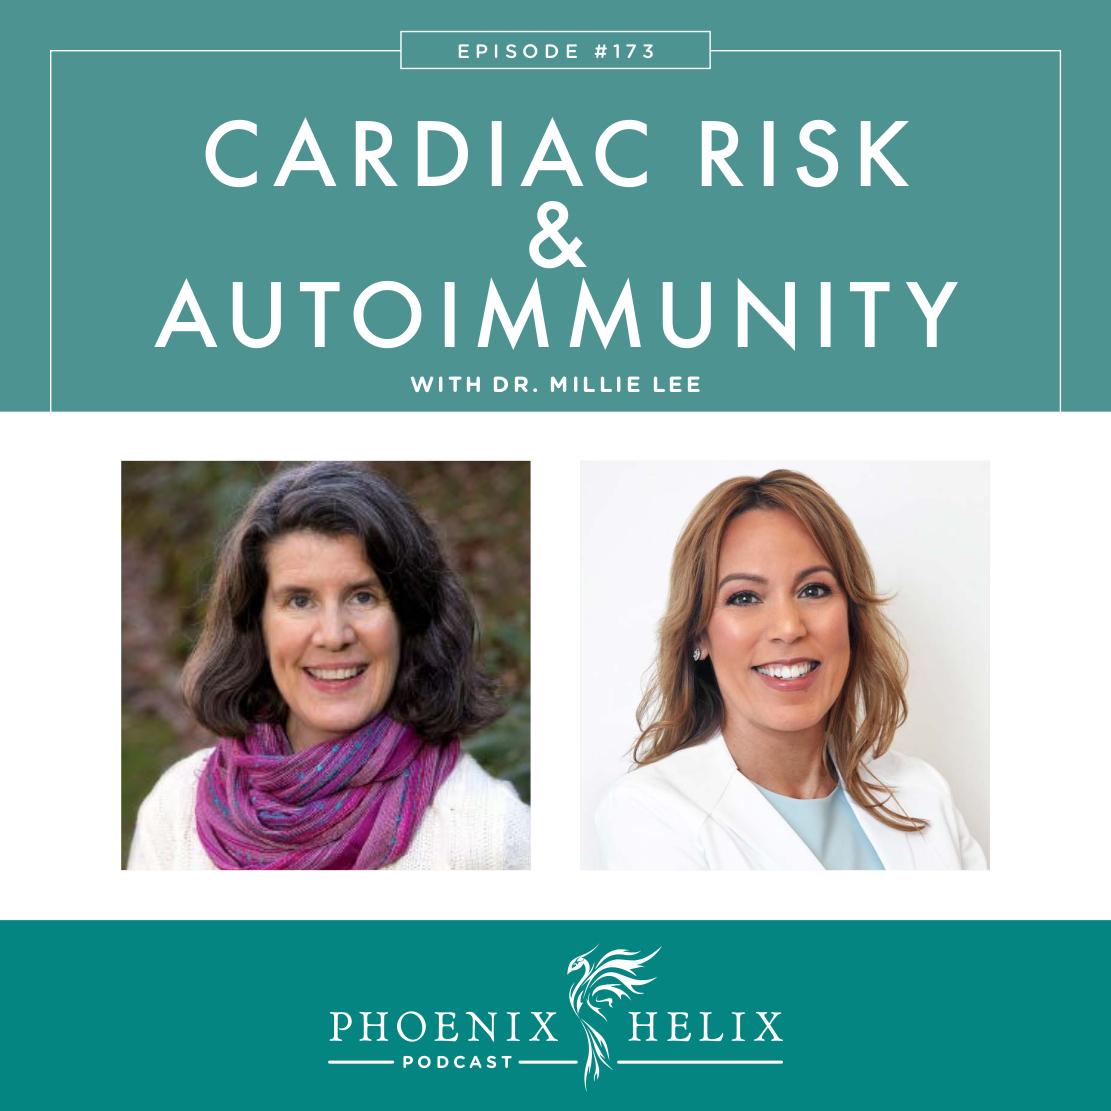 Cardiac Risk and Autoimmune Disease with Dr. Millie Lee | Phoenix Helix Podcast